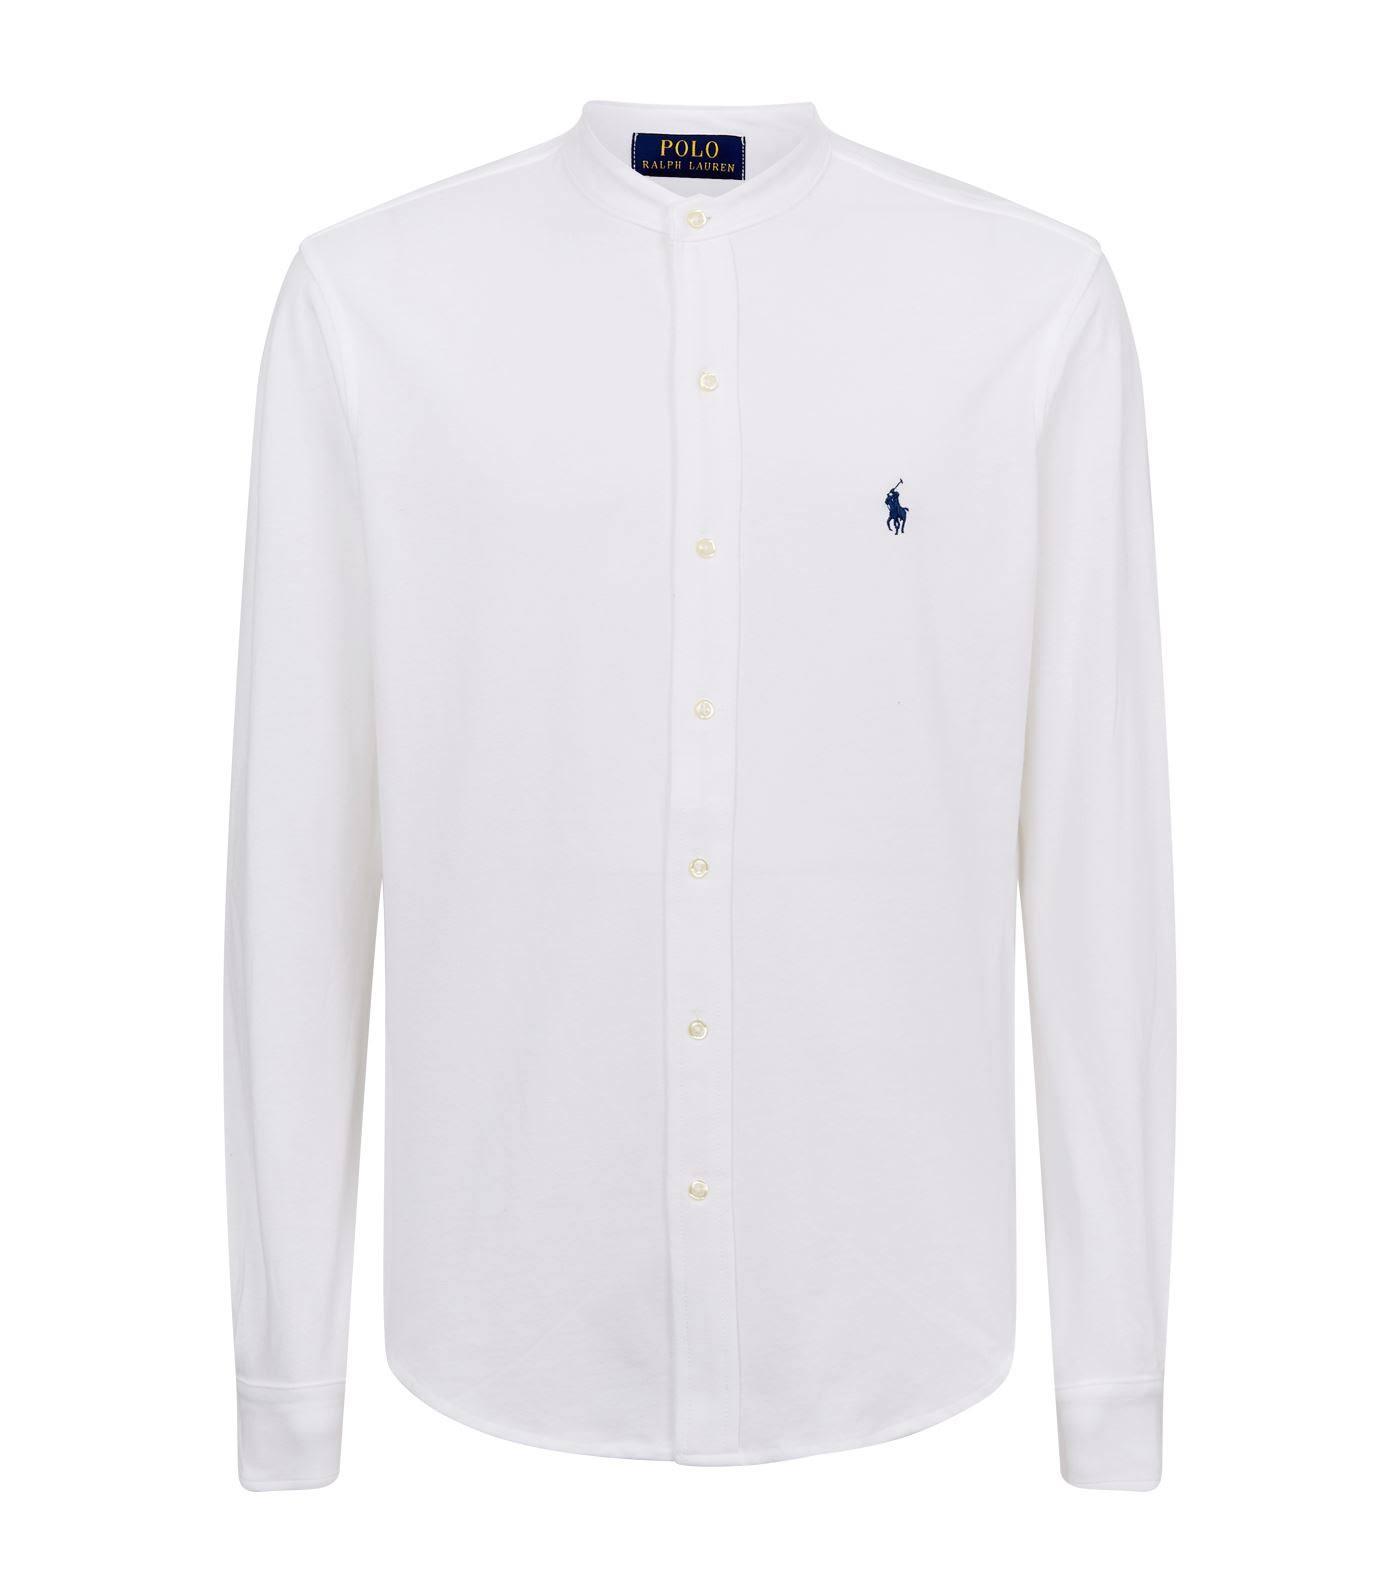 Polo Mercerisierter Regular Ralph Aus fit Hemd Baumwolle Lauren nYqrFO1Y